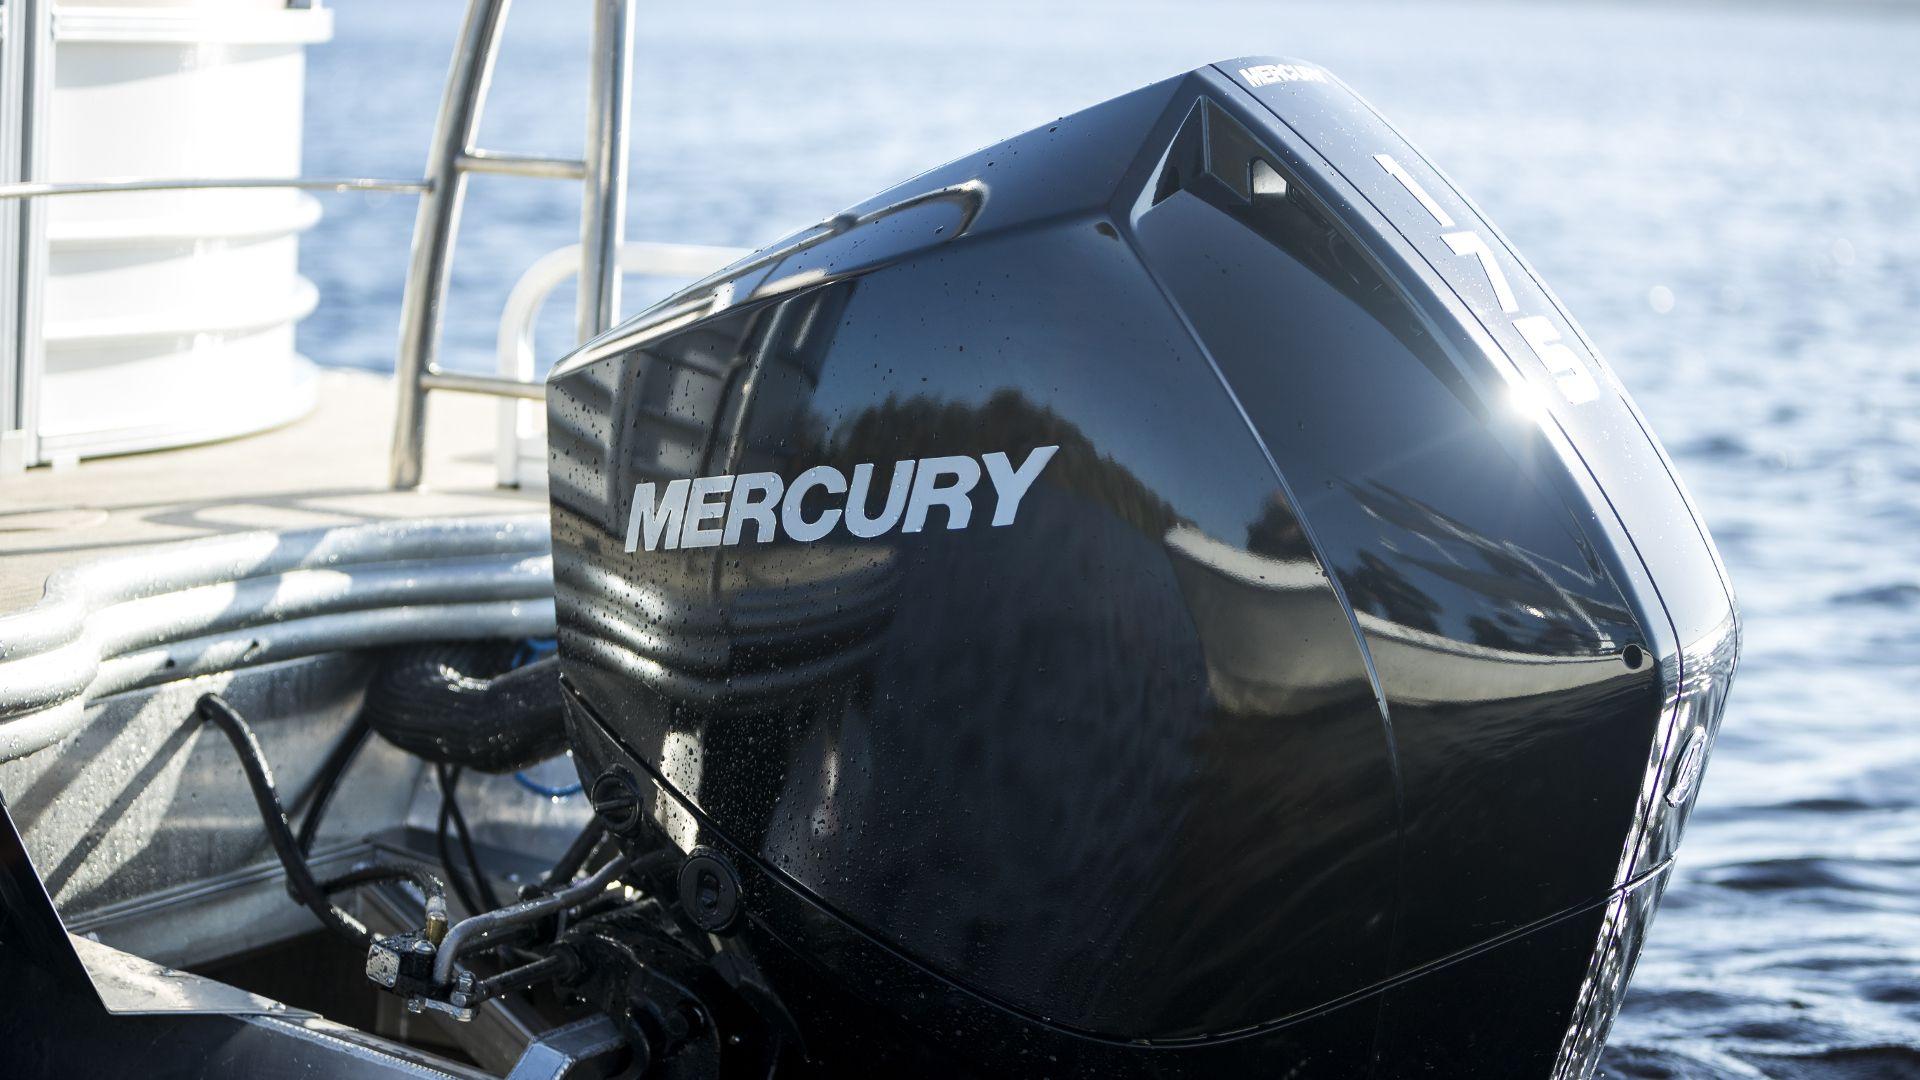 nouvelle gamme mercury fourstroke et mercury verado